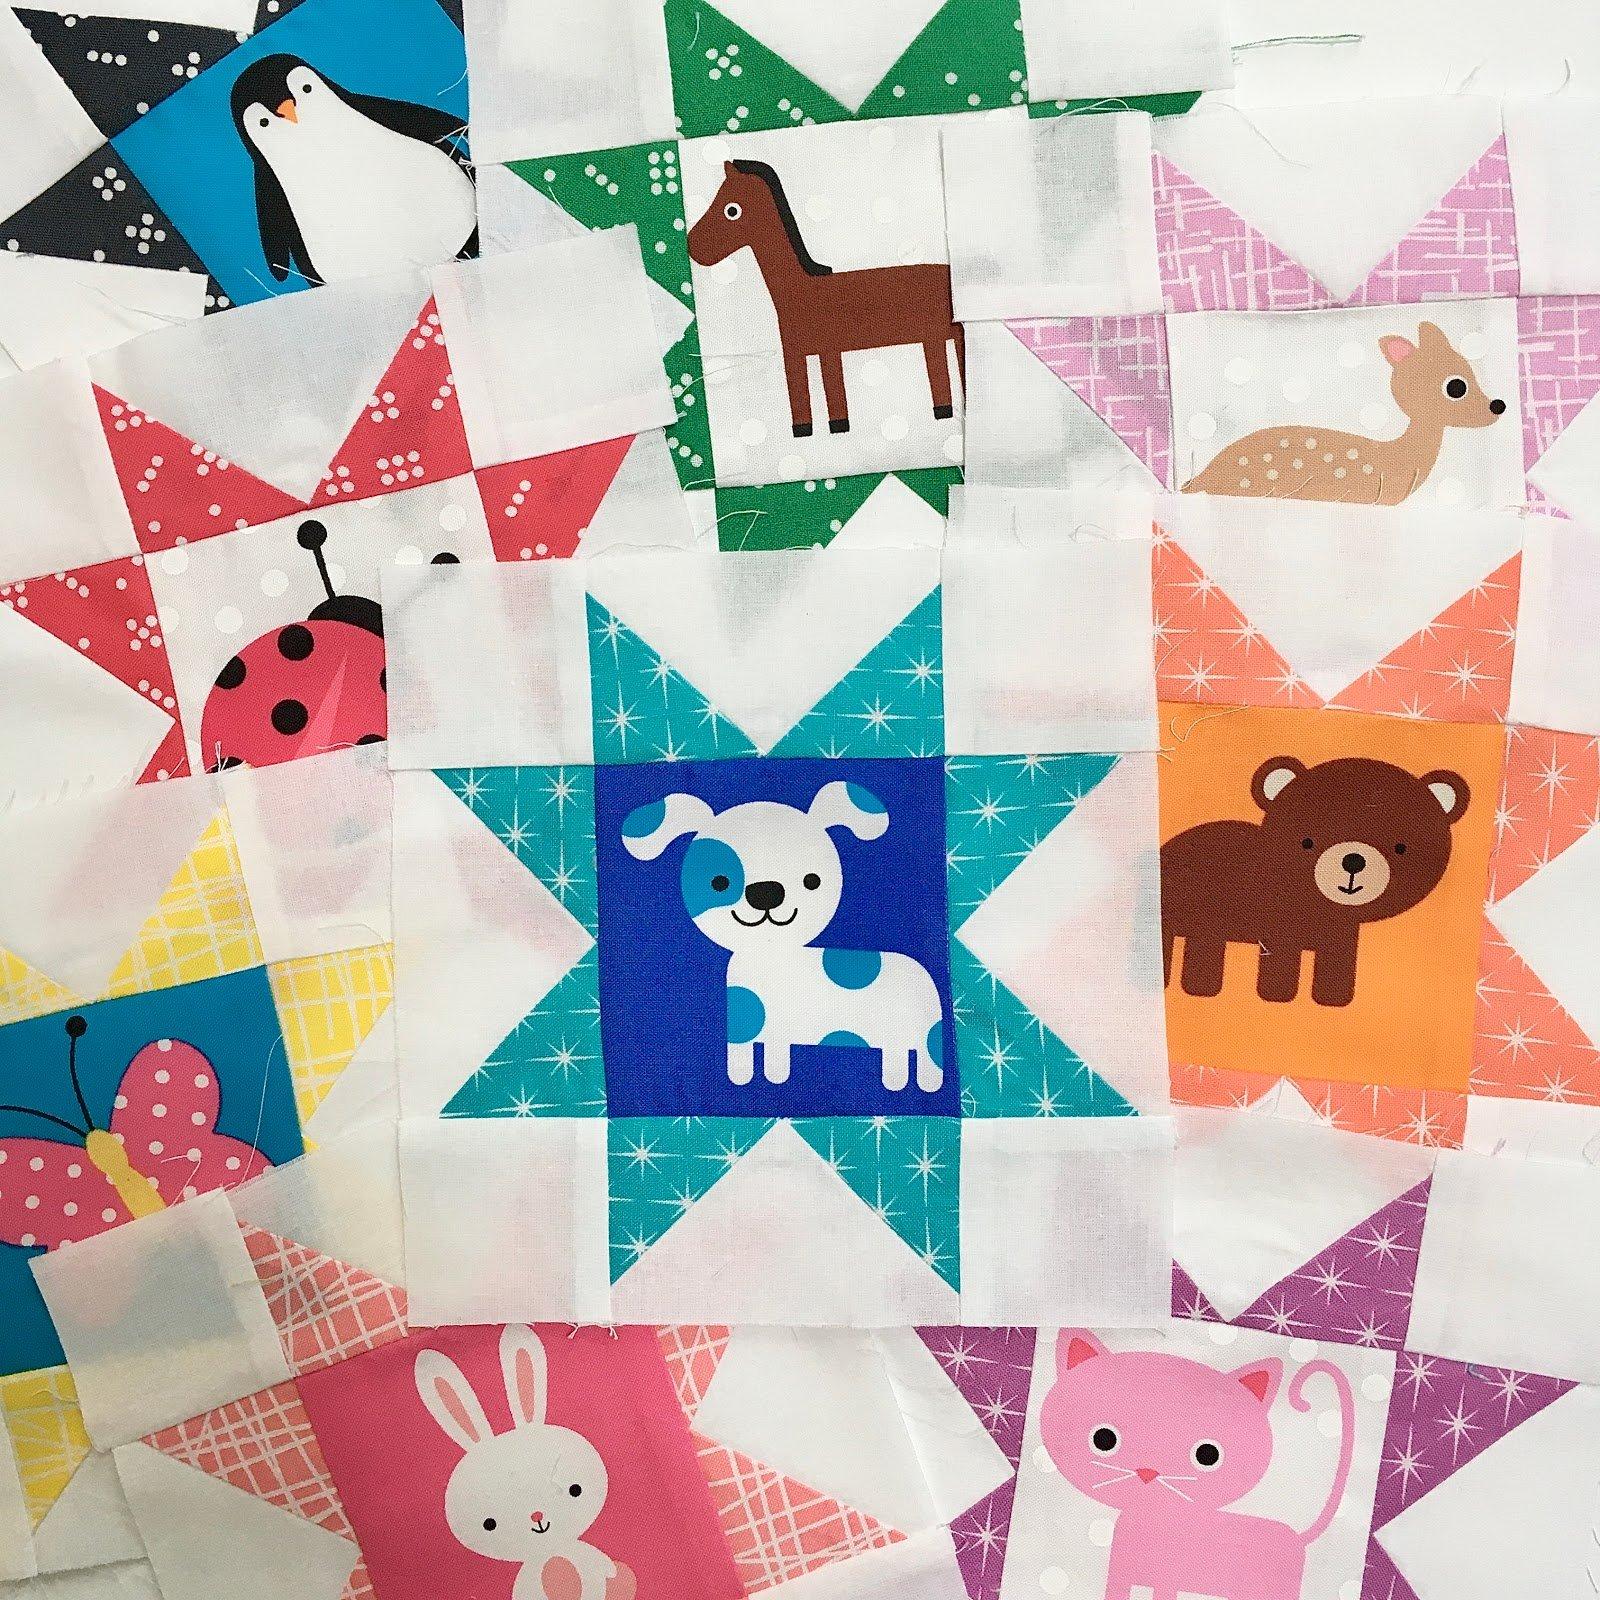 15-sawtooth star quilt blocks with animals in center block